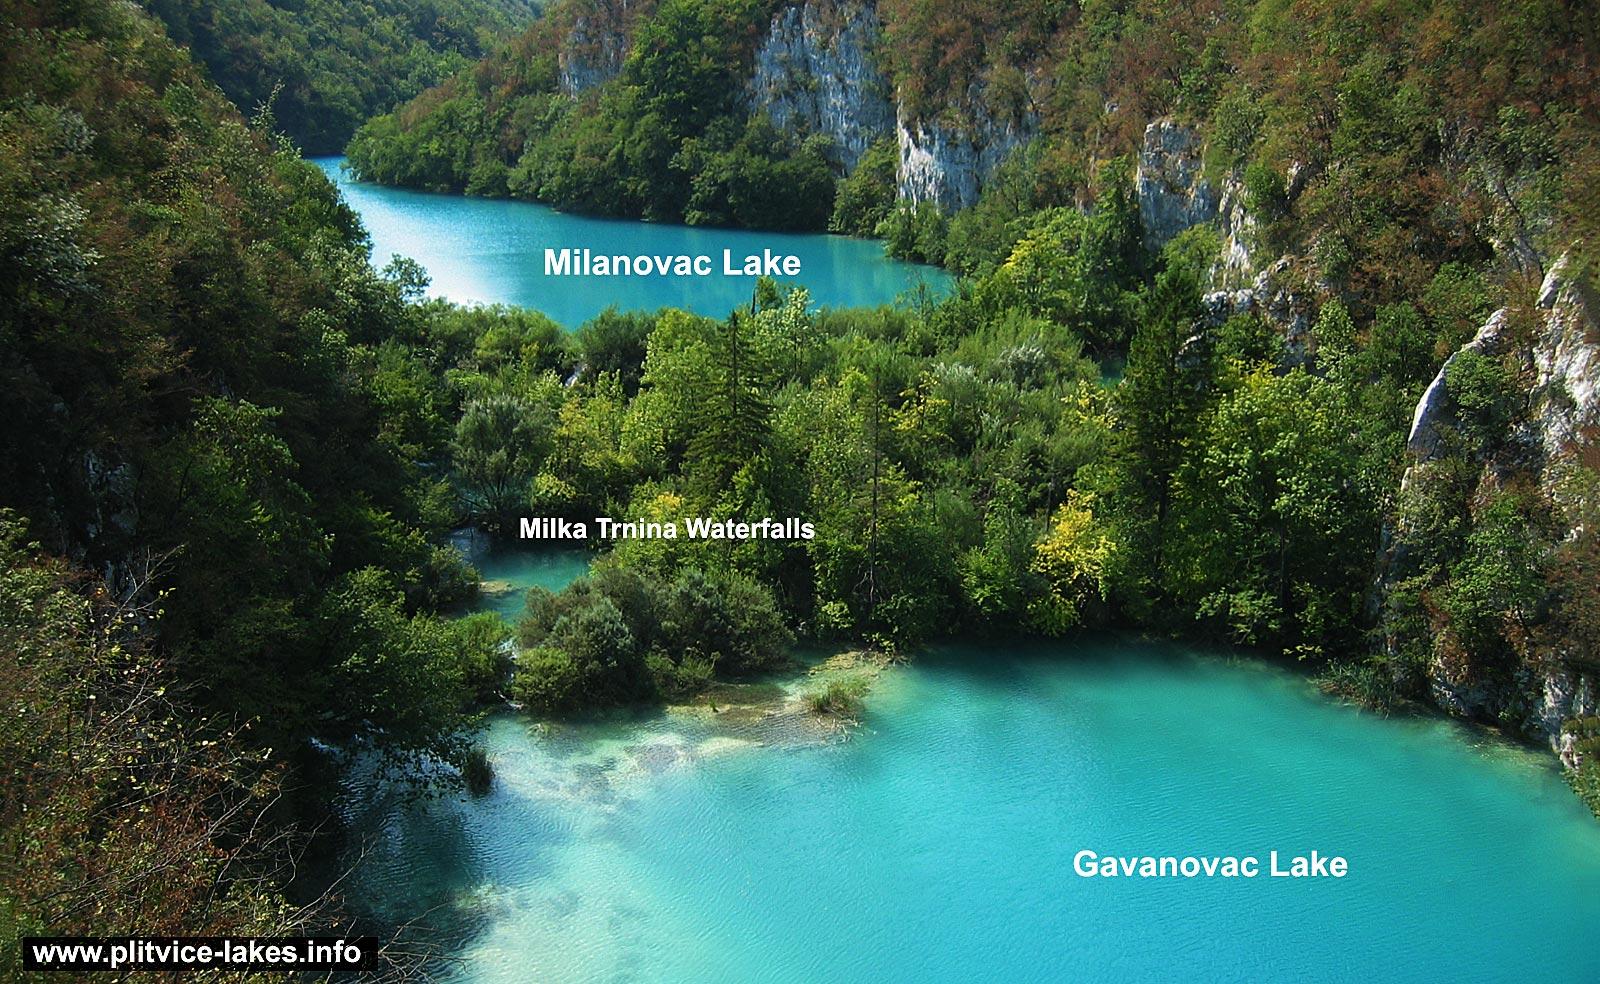 Milke Trnine Waterfalls with Milanovac and Gavanovac